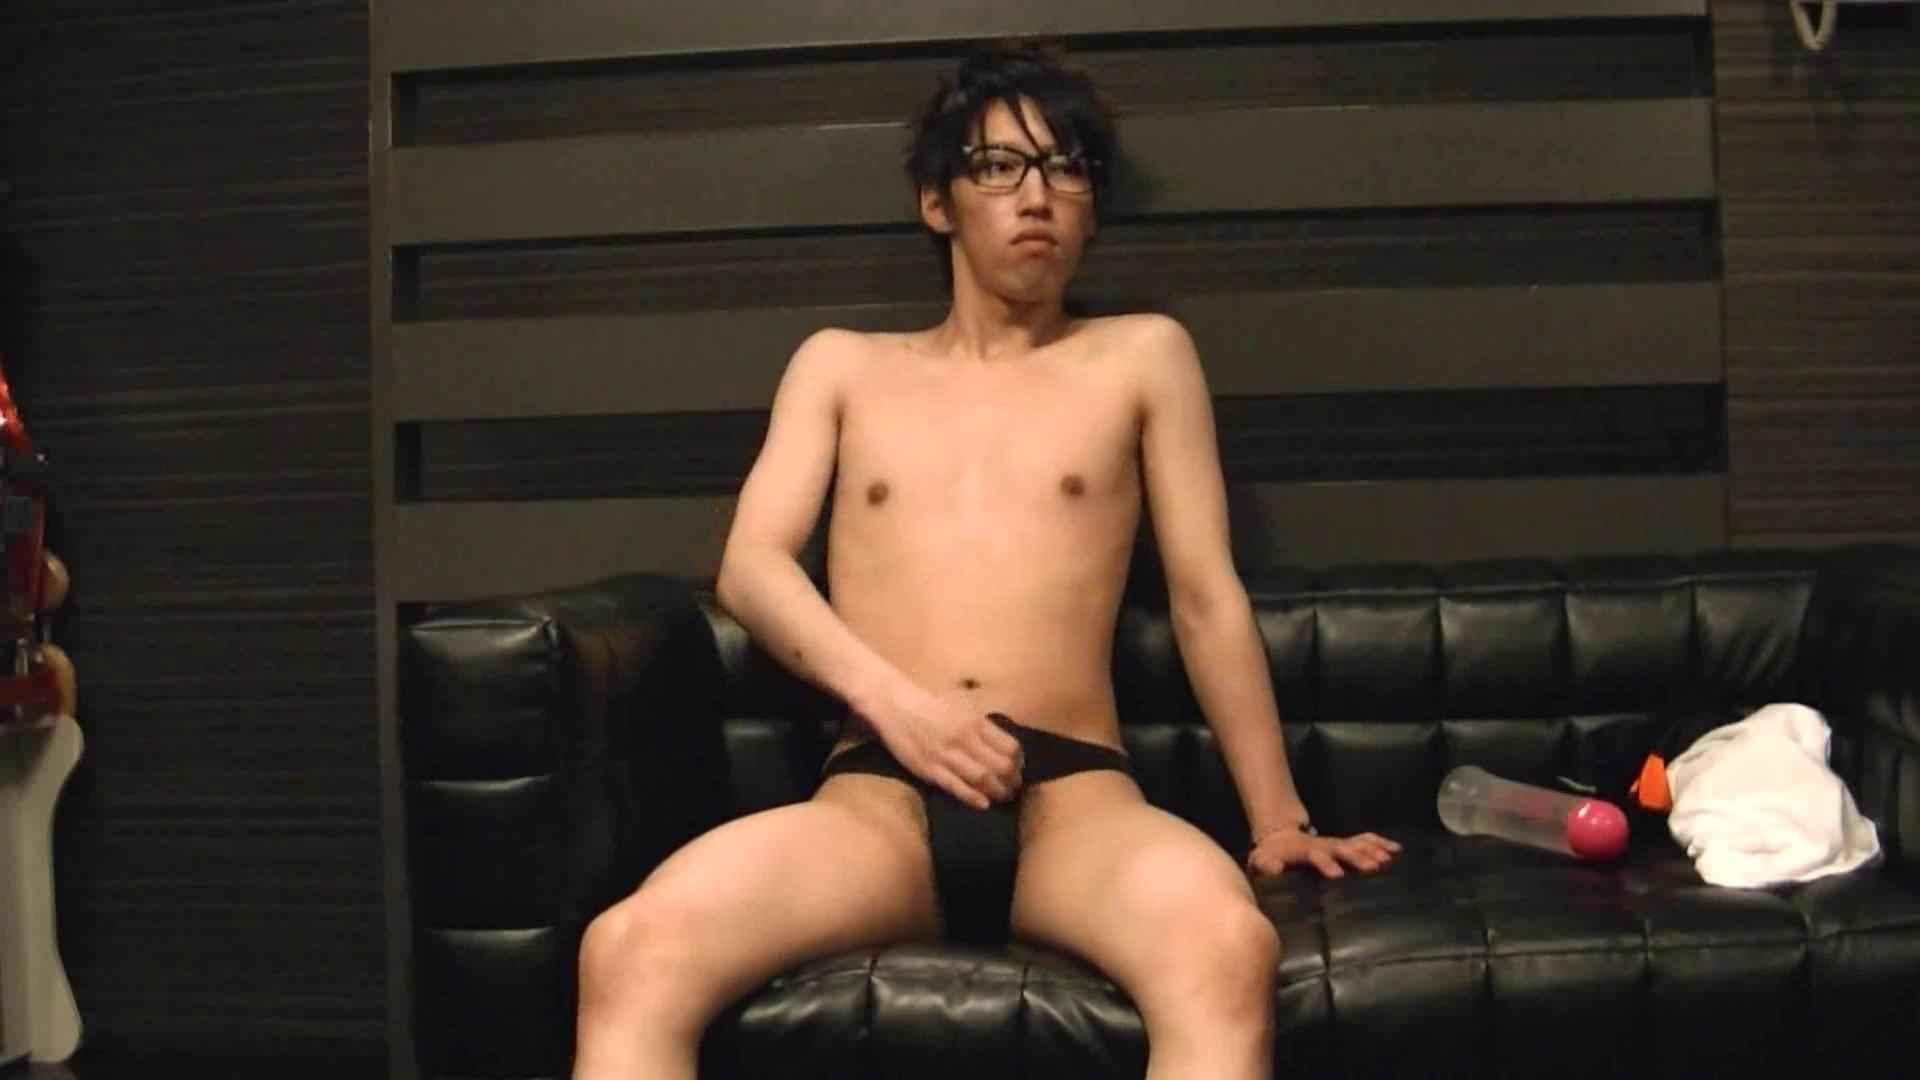 ONA見せカーニバル!! Vol3 男・男 ゲイ無料無修正画像 72pic 24